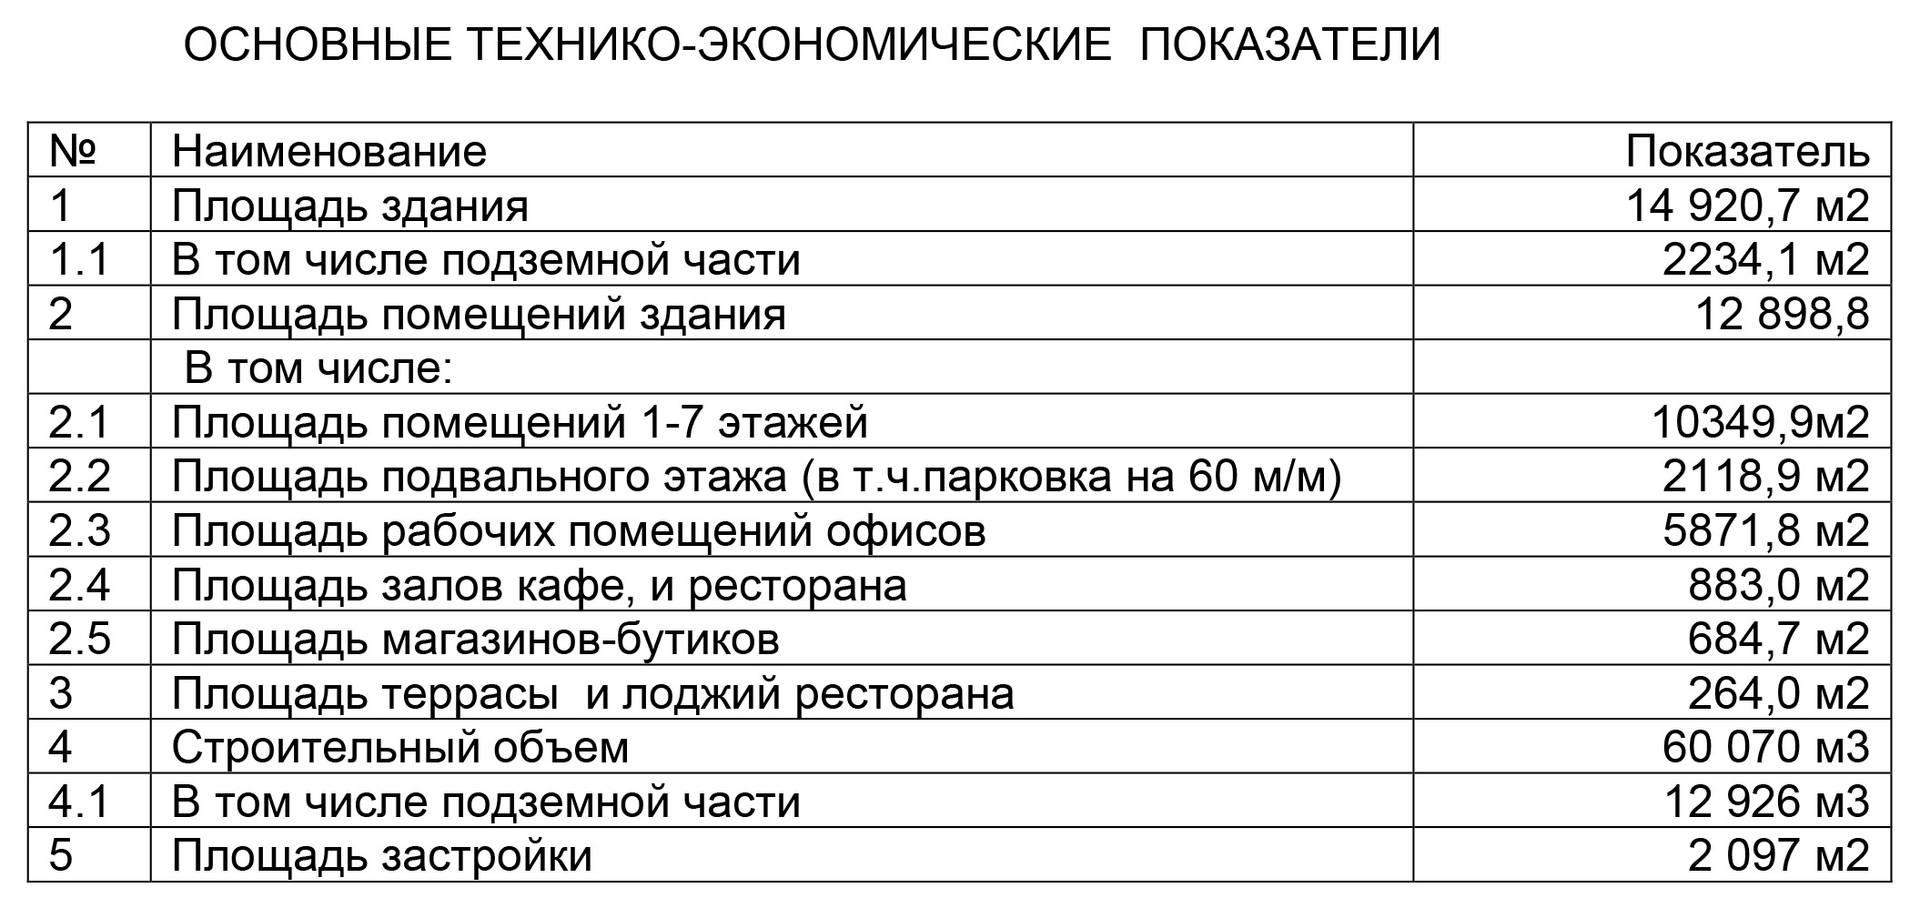 Ереван сайт ТЭП.jpg